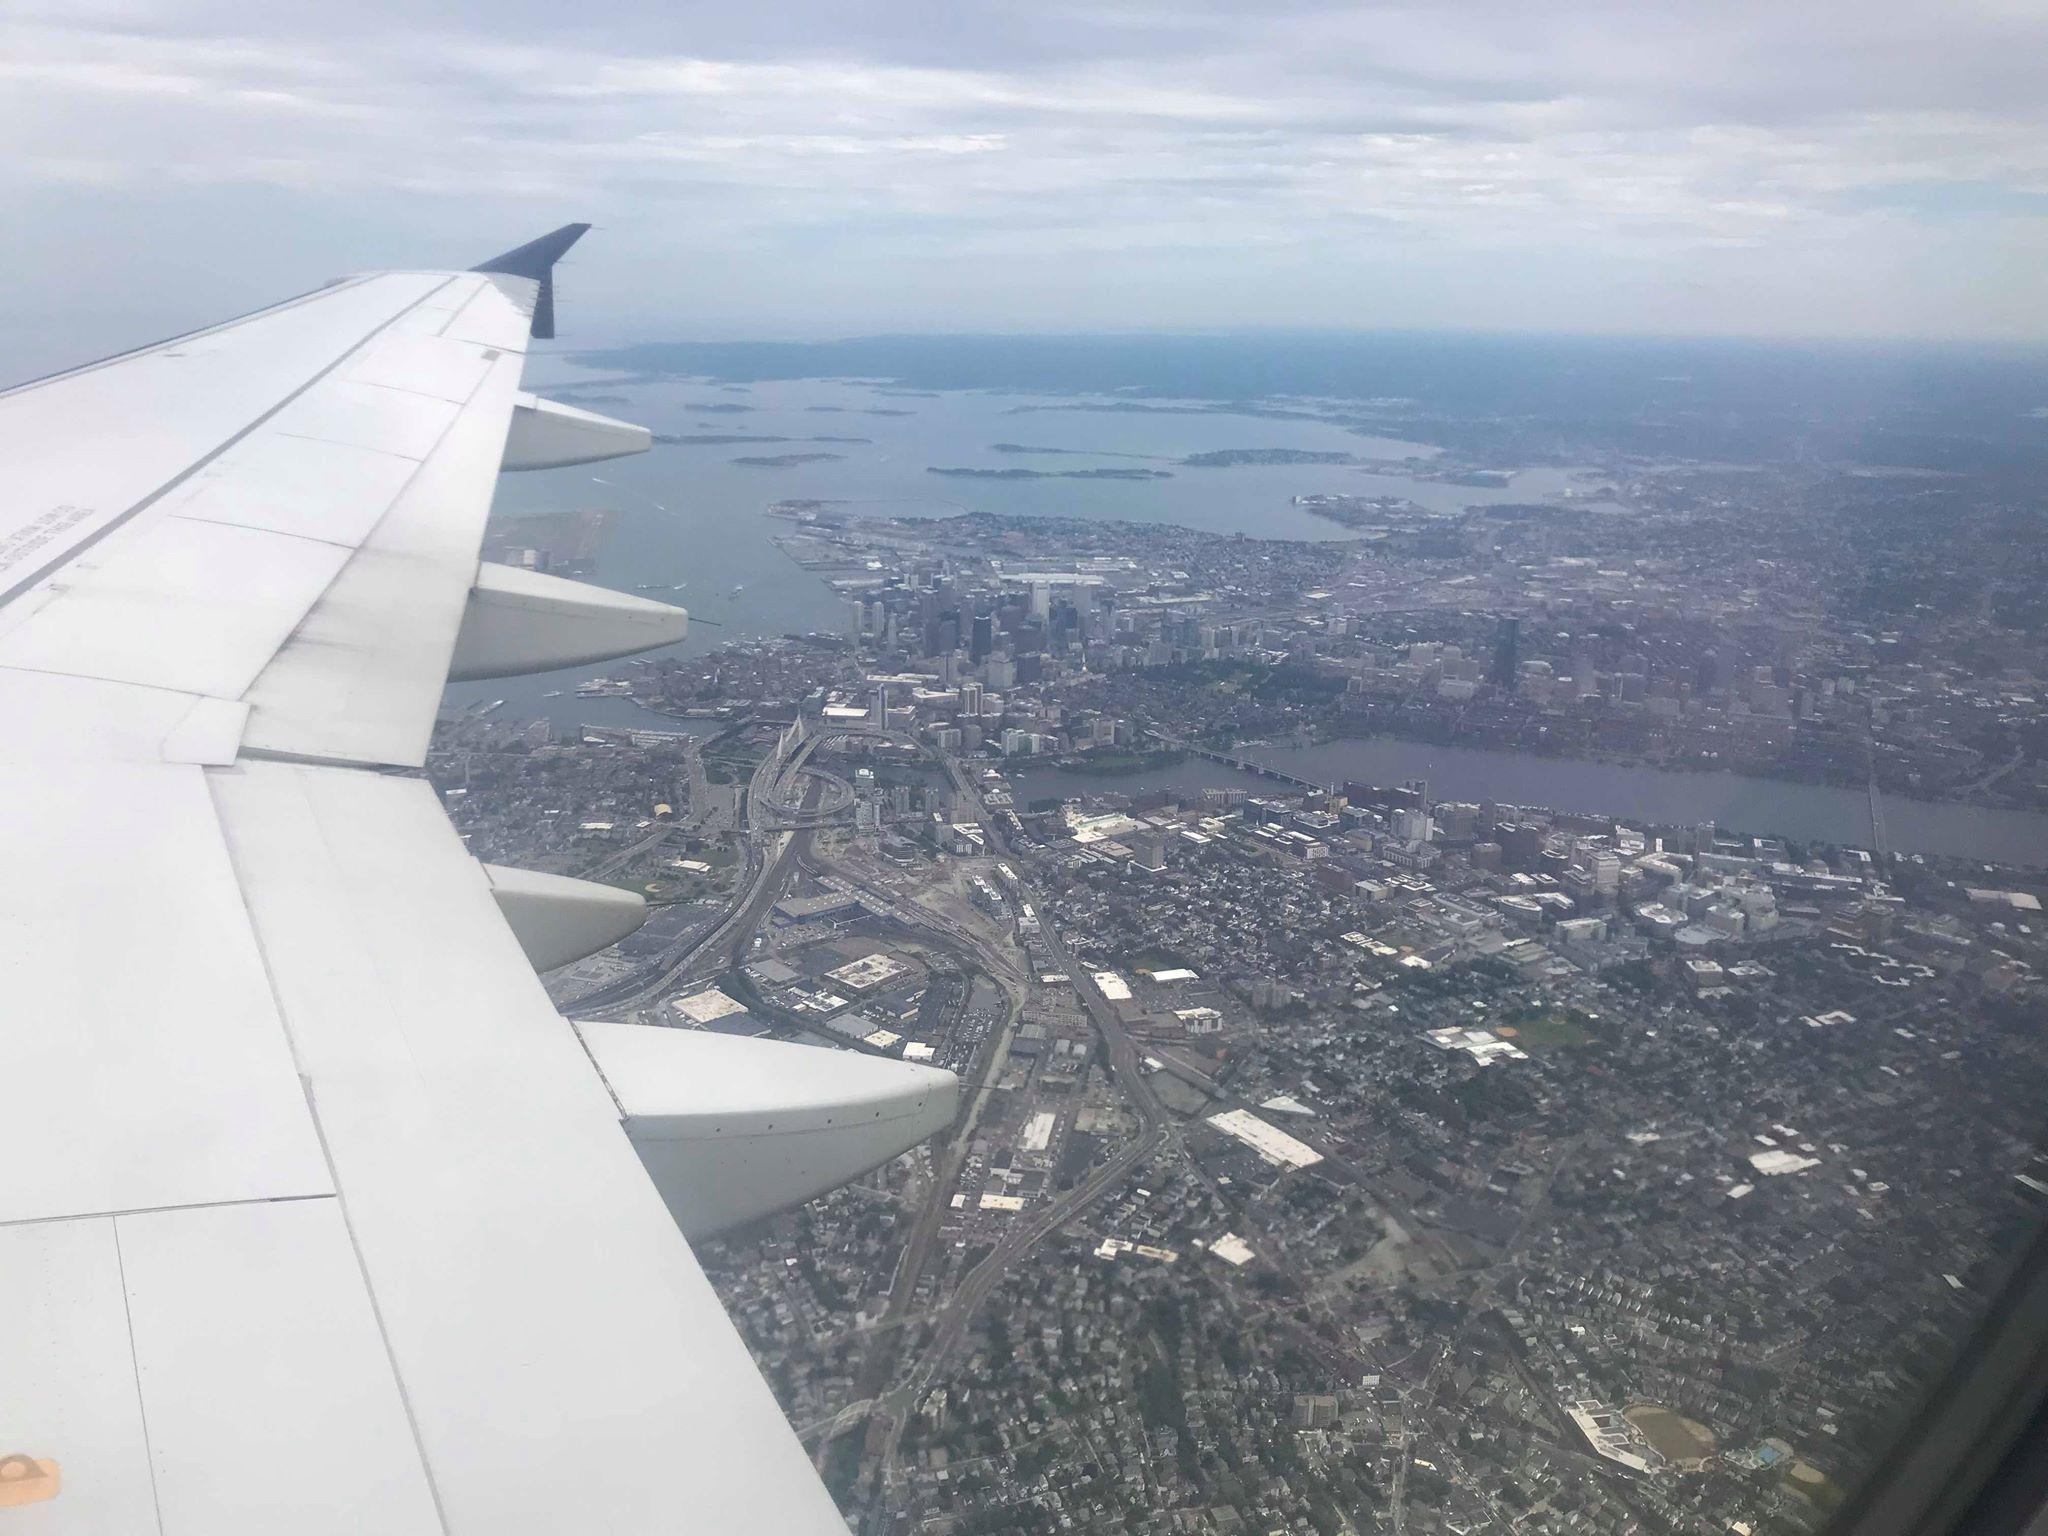 Flying into Boston -Richard Seidlitz